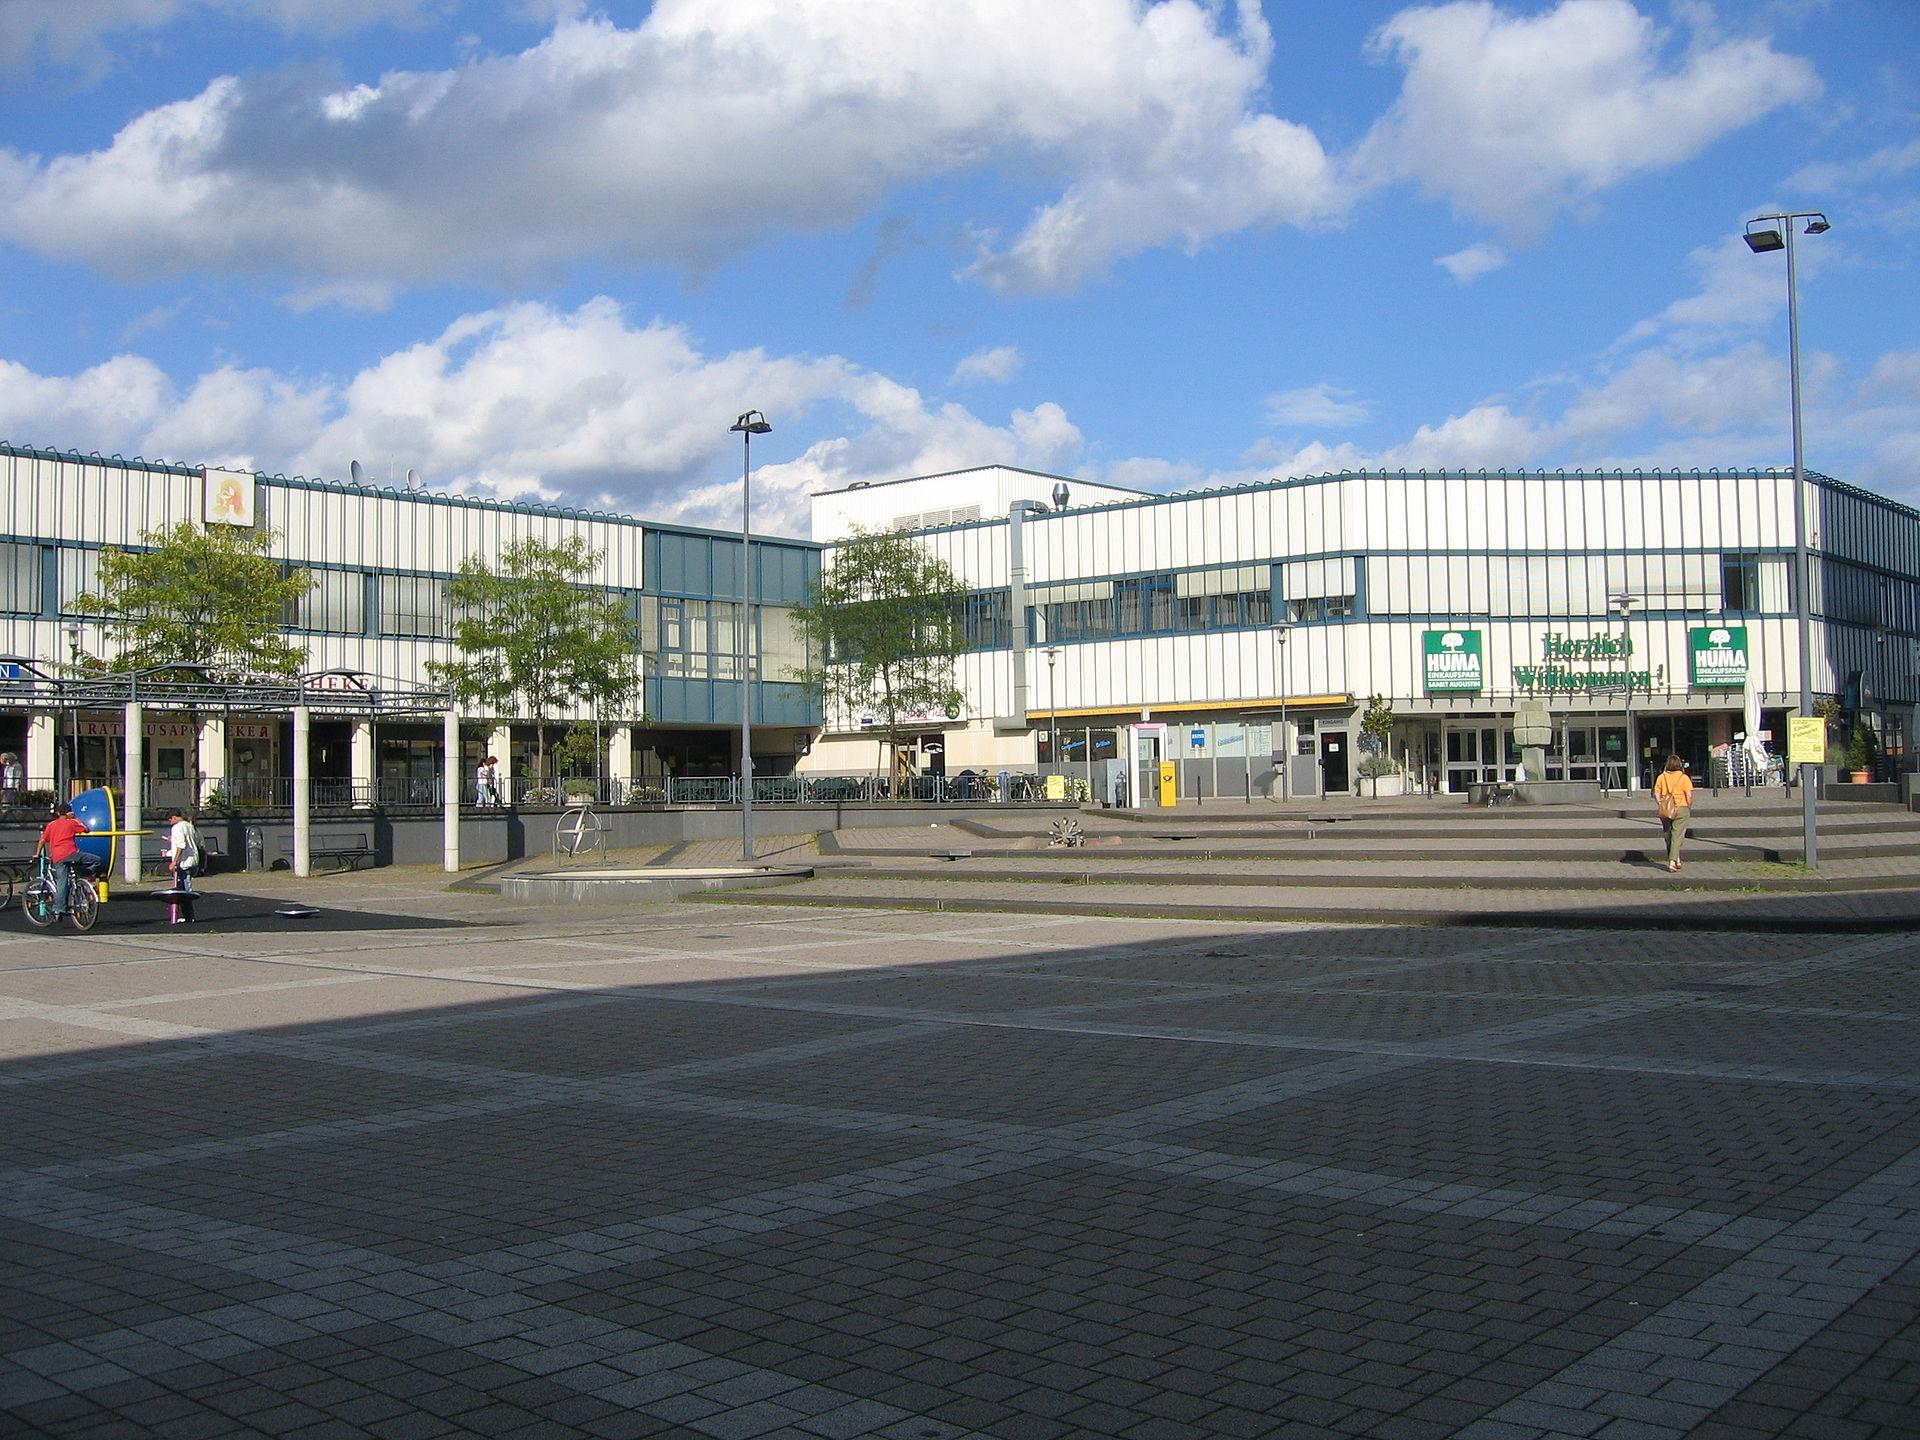 Huma Einkaufspark Sankt Augustin Wikipedia